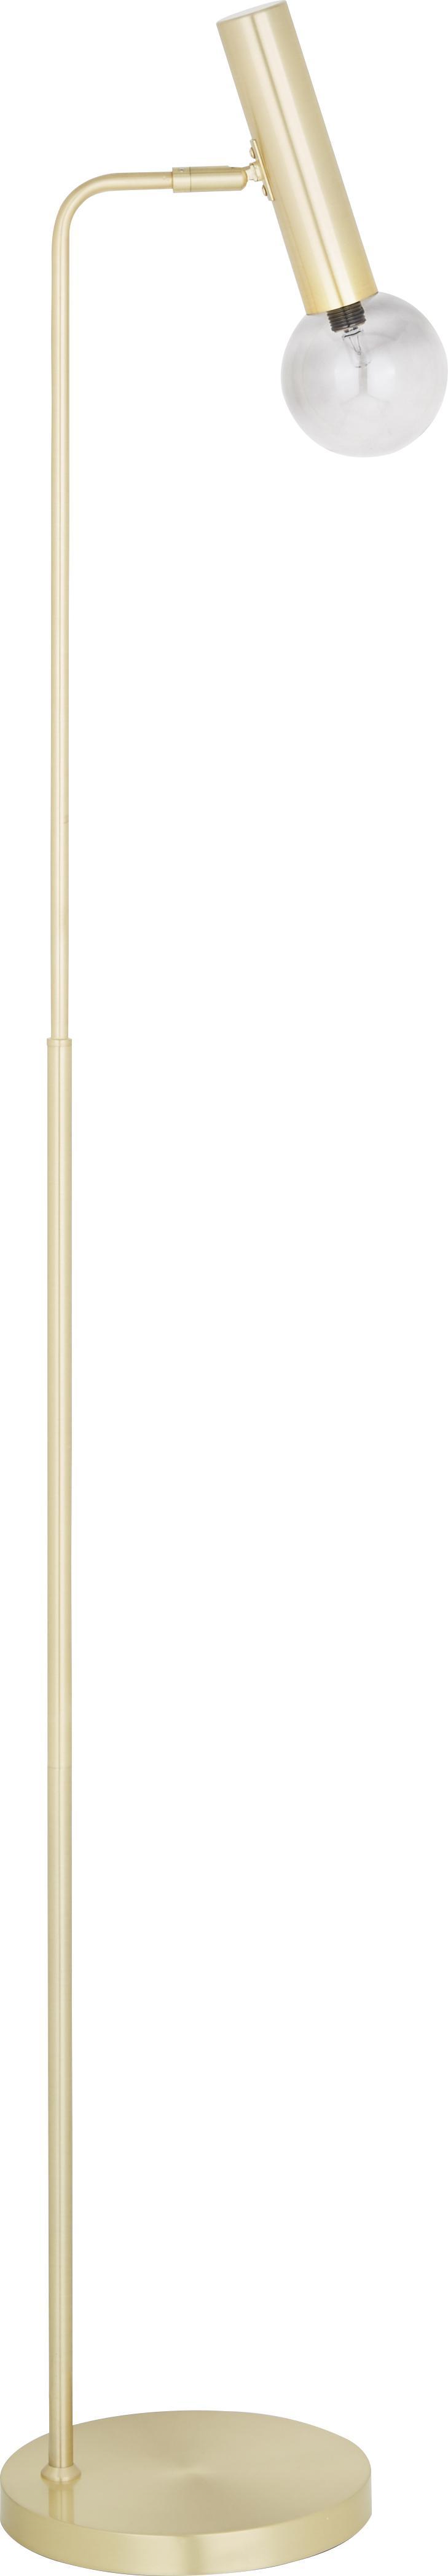 Leselampe Wilson mit Glasschirm, Lampenschirm: Glas, Metall, Lampenfuß: Metall, vermessingt, Messing, Ø 23 x H 153 cm